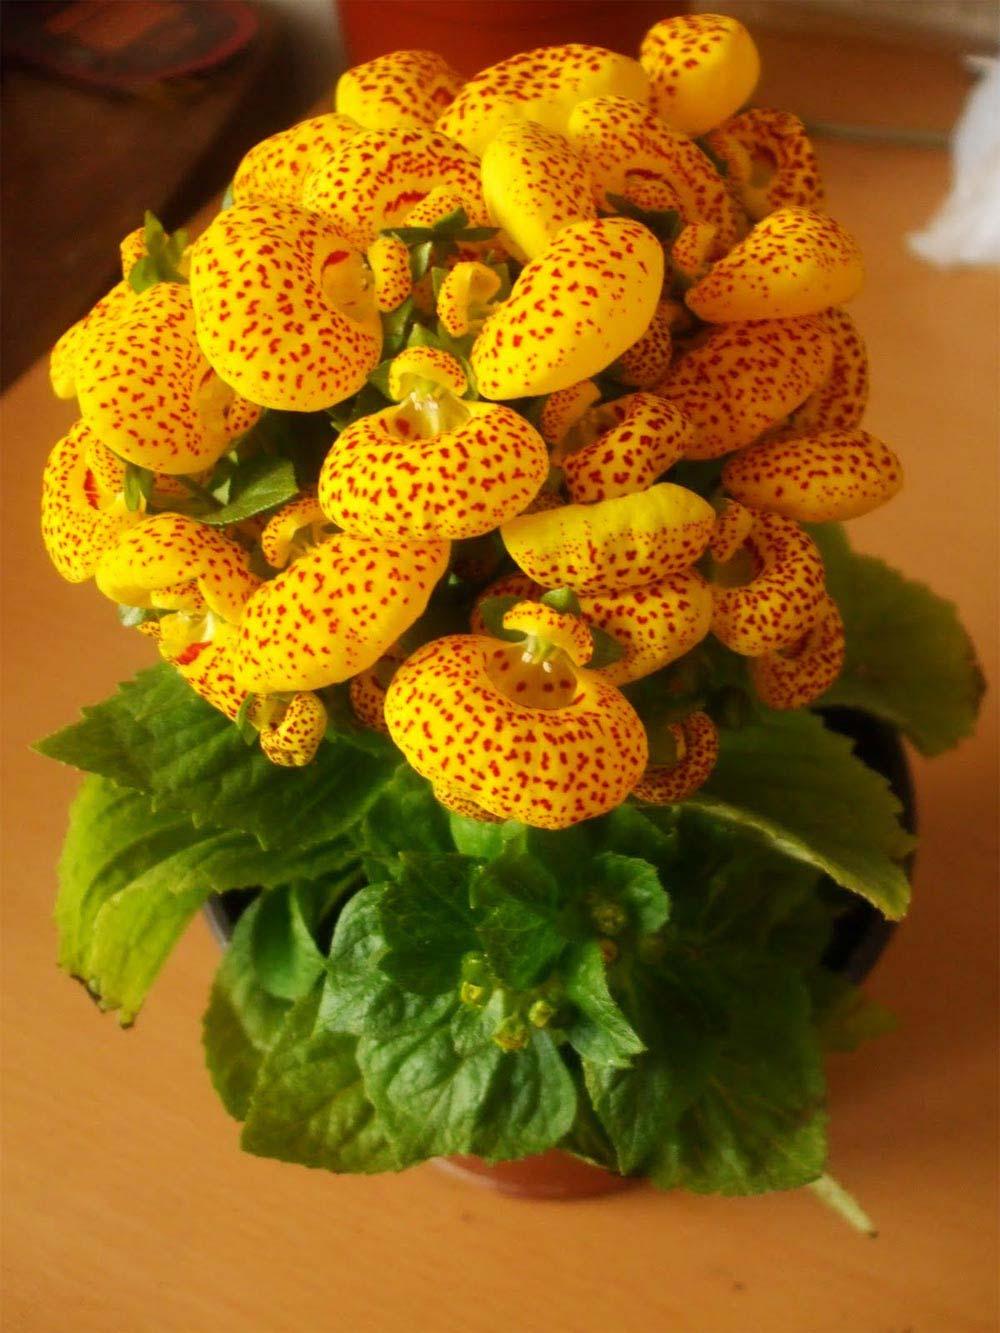 Calceolaria x herbeohybrida amarela